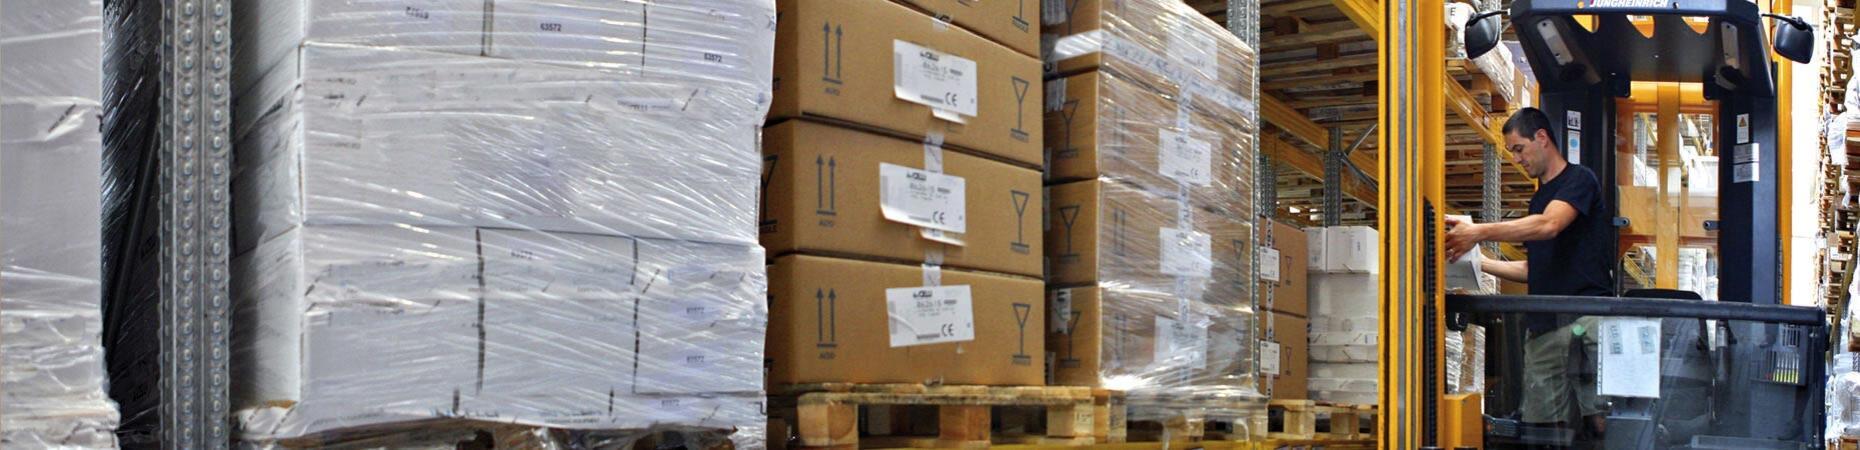 ecoservice-ravenna it servizi-logistica-magazzino-ravenna 005